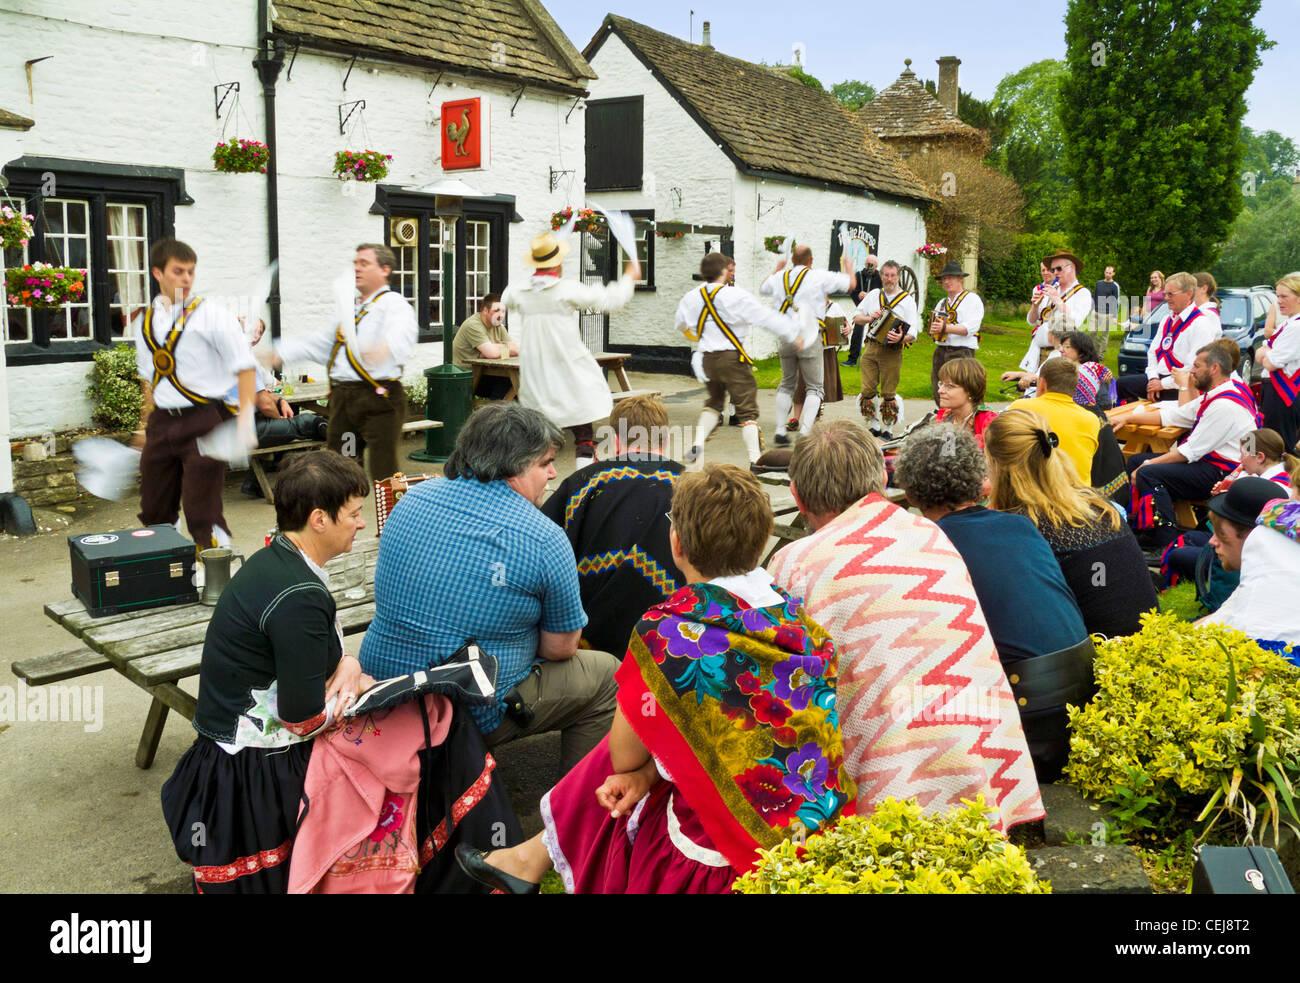 Morris Dancing At A Traditional English Country Pub England GB UK EU Europe